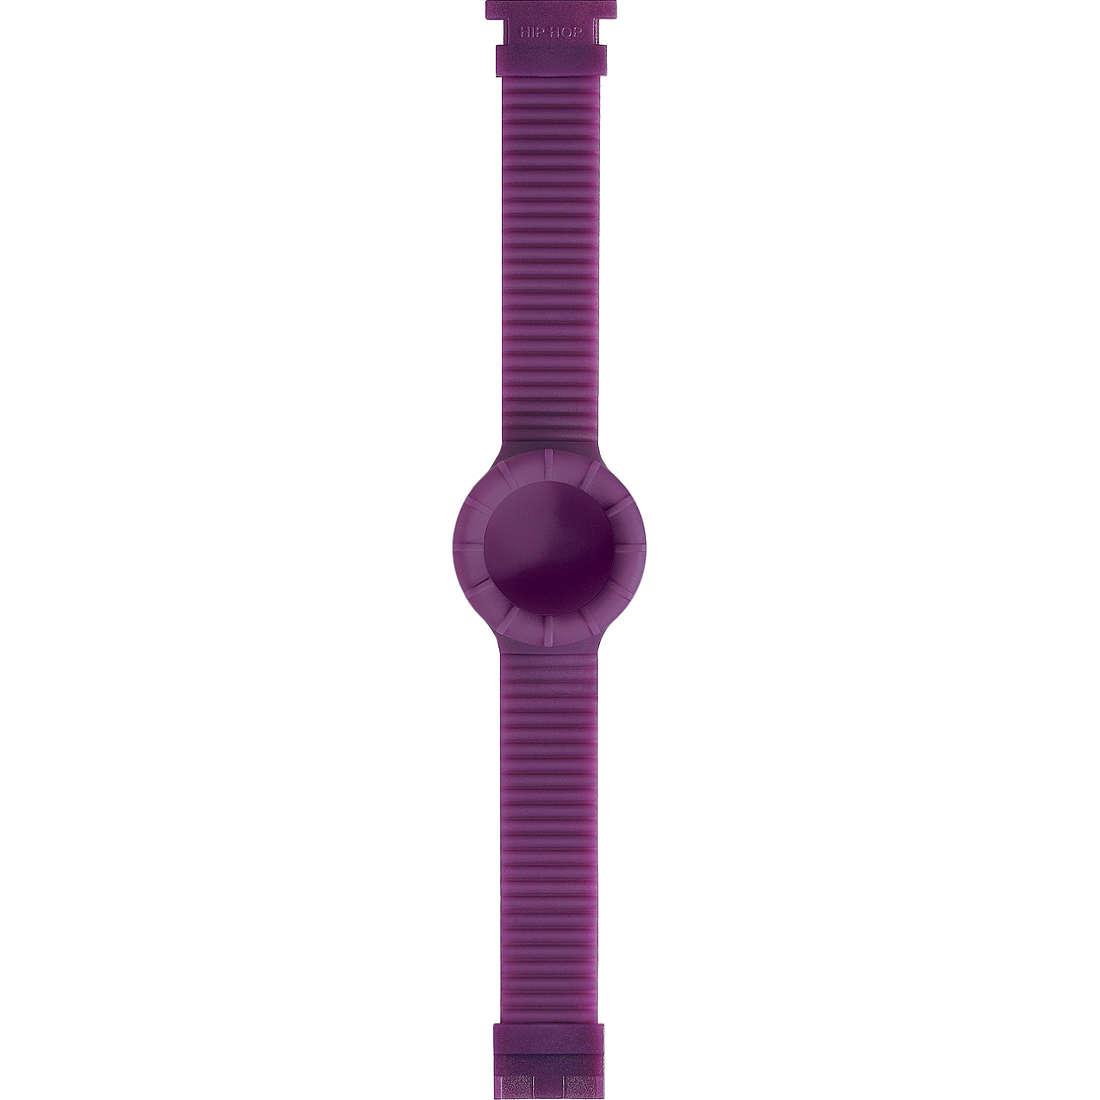 orologio accessorio unisex Hip Hop HBU0028